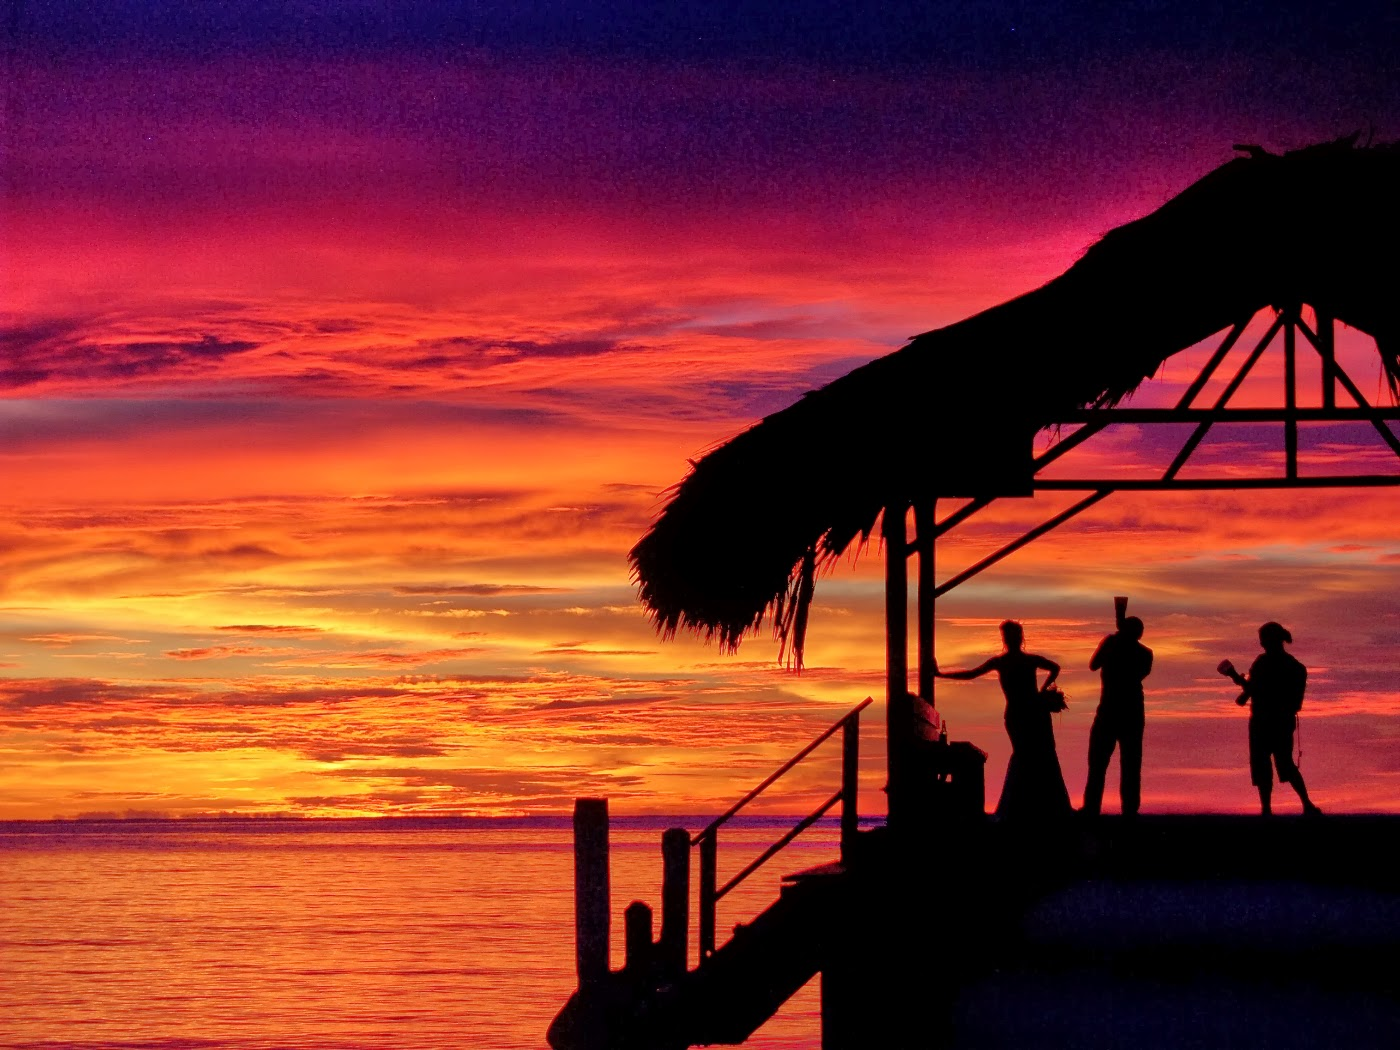 Sunset Wedding Photos: Sunset Wedding